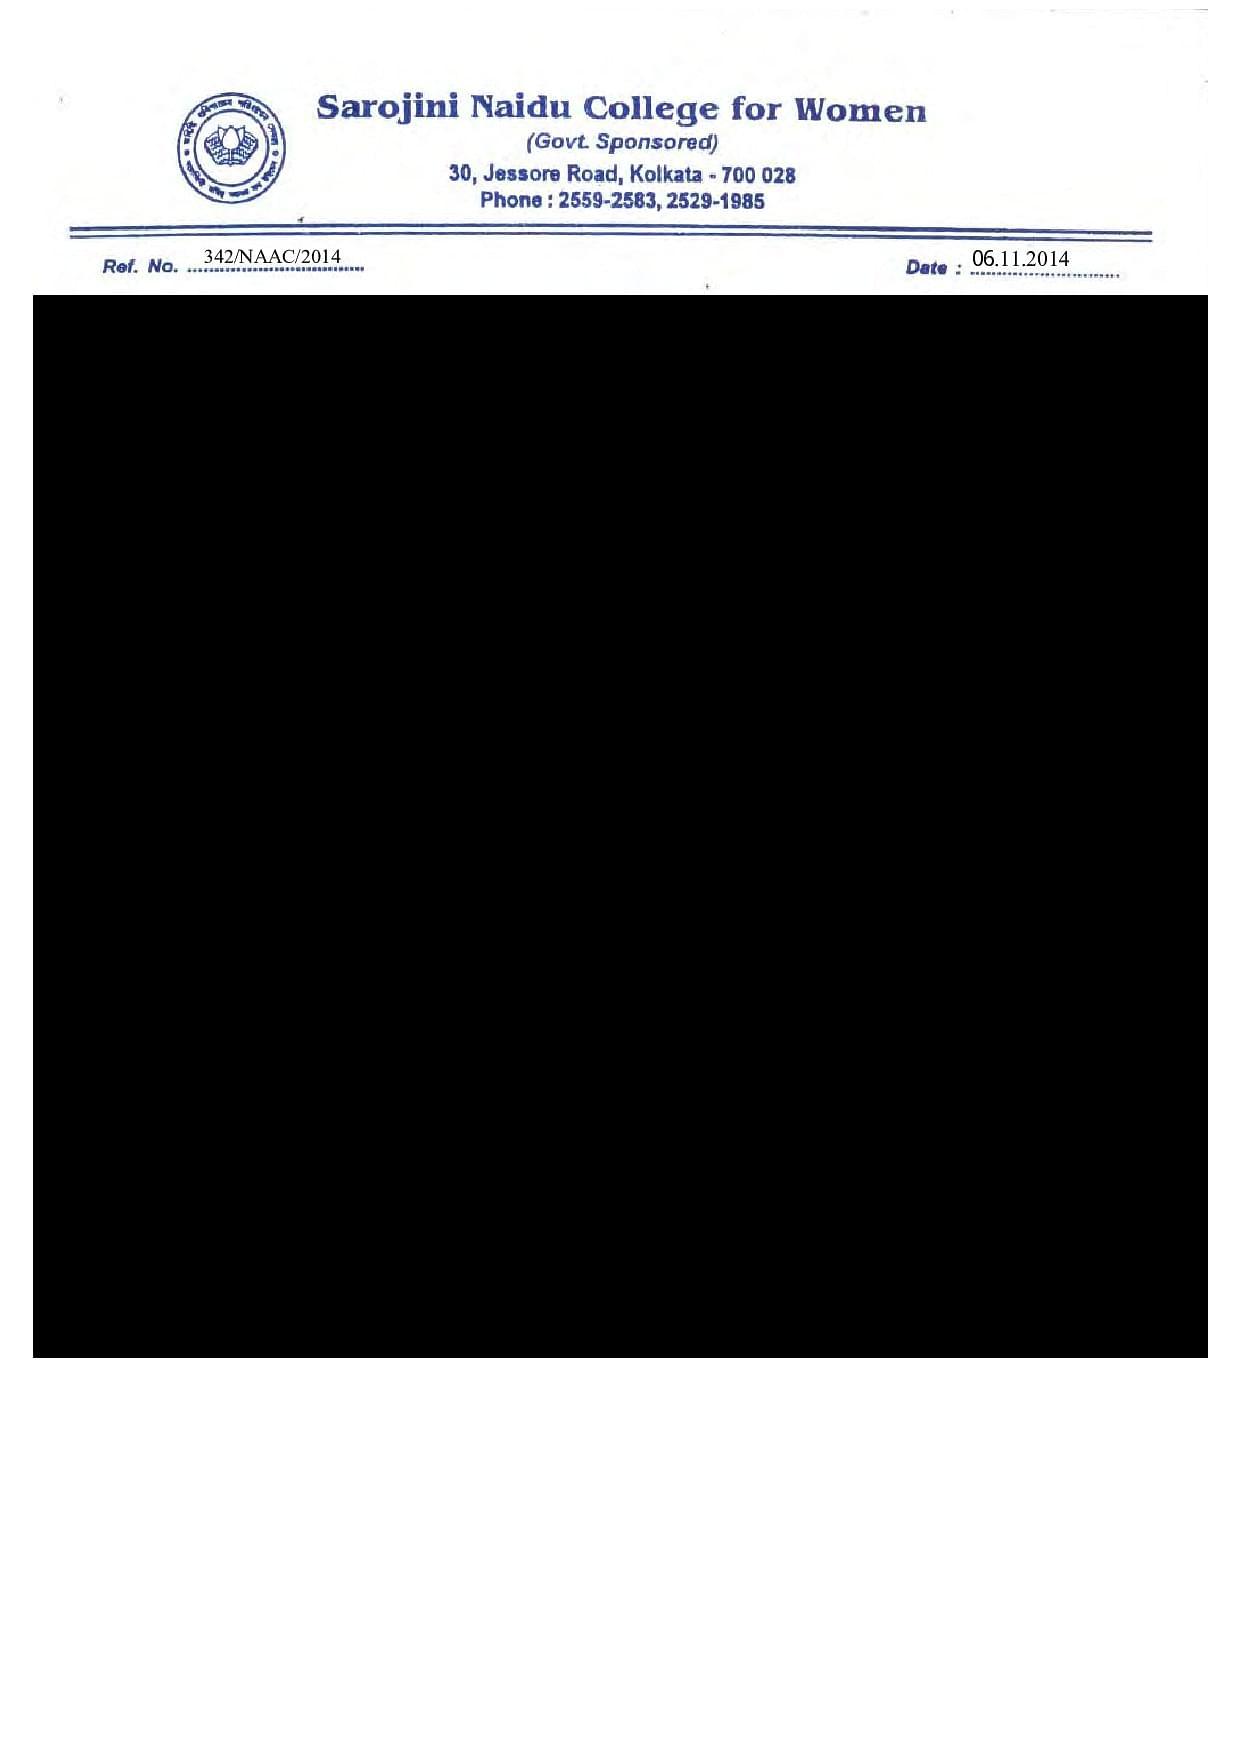 autobiography of sarojini naidu pdf